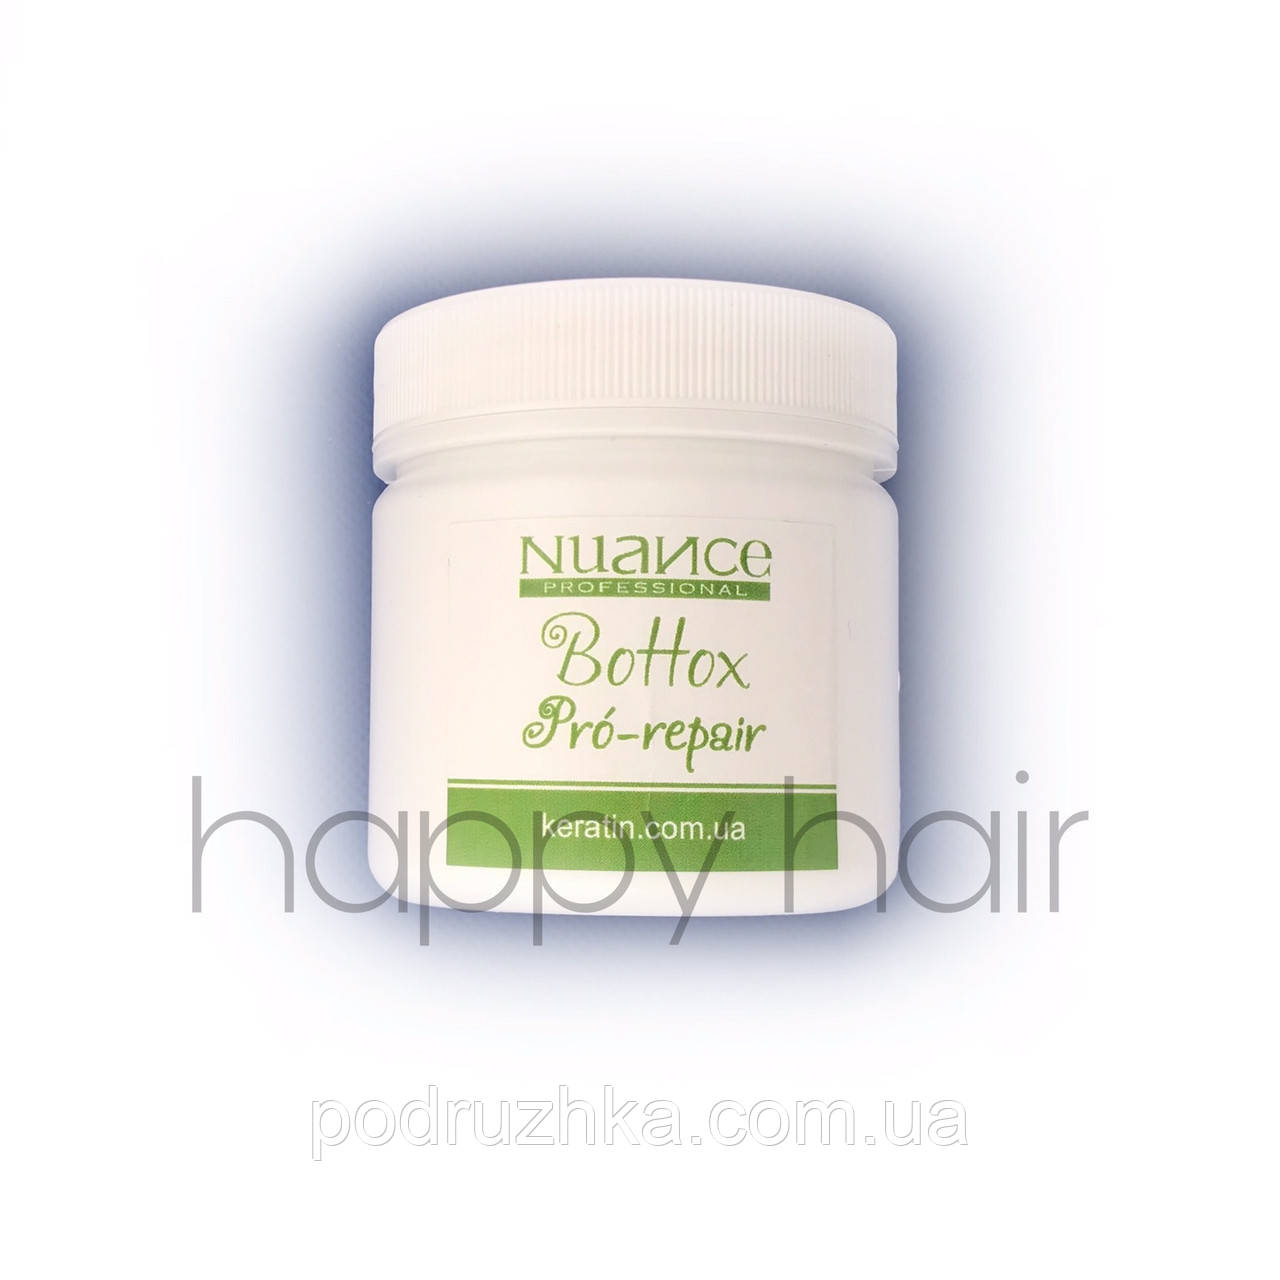 Nuance btox Pro Repair ботекс для волос 200 г